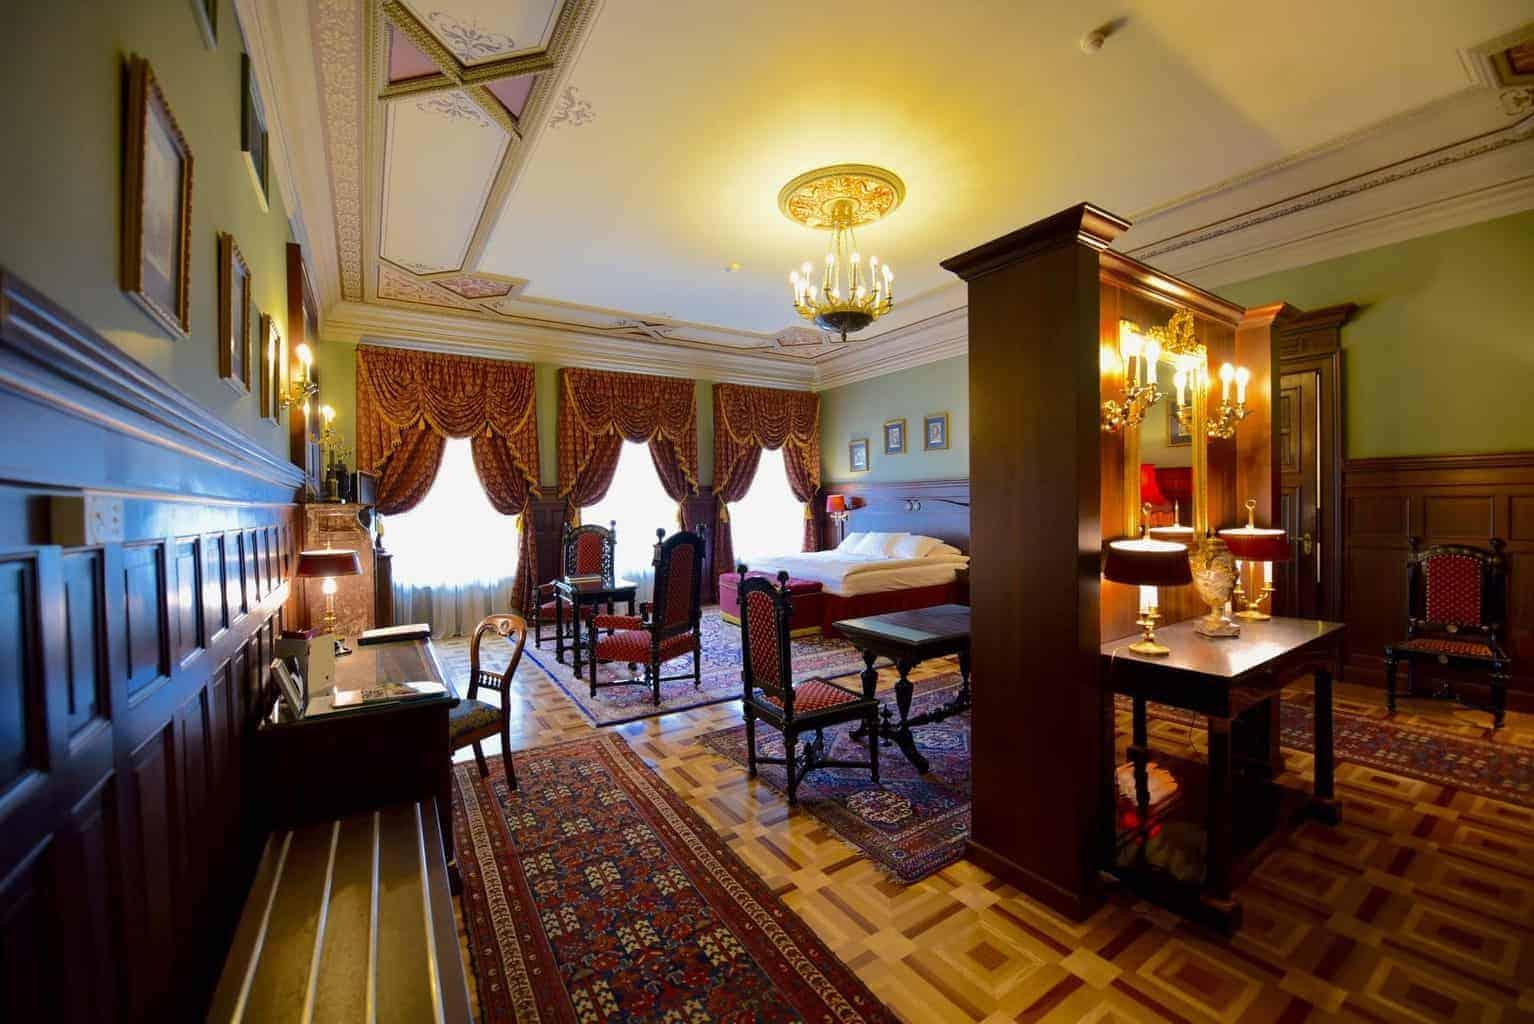 Gallery Park Hotel, Riga Latvia Royal Suite